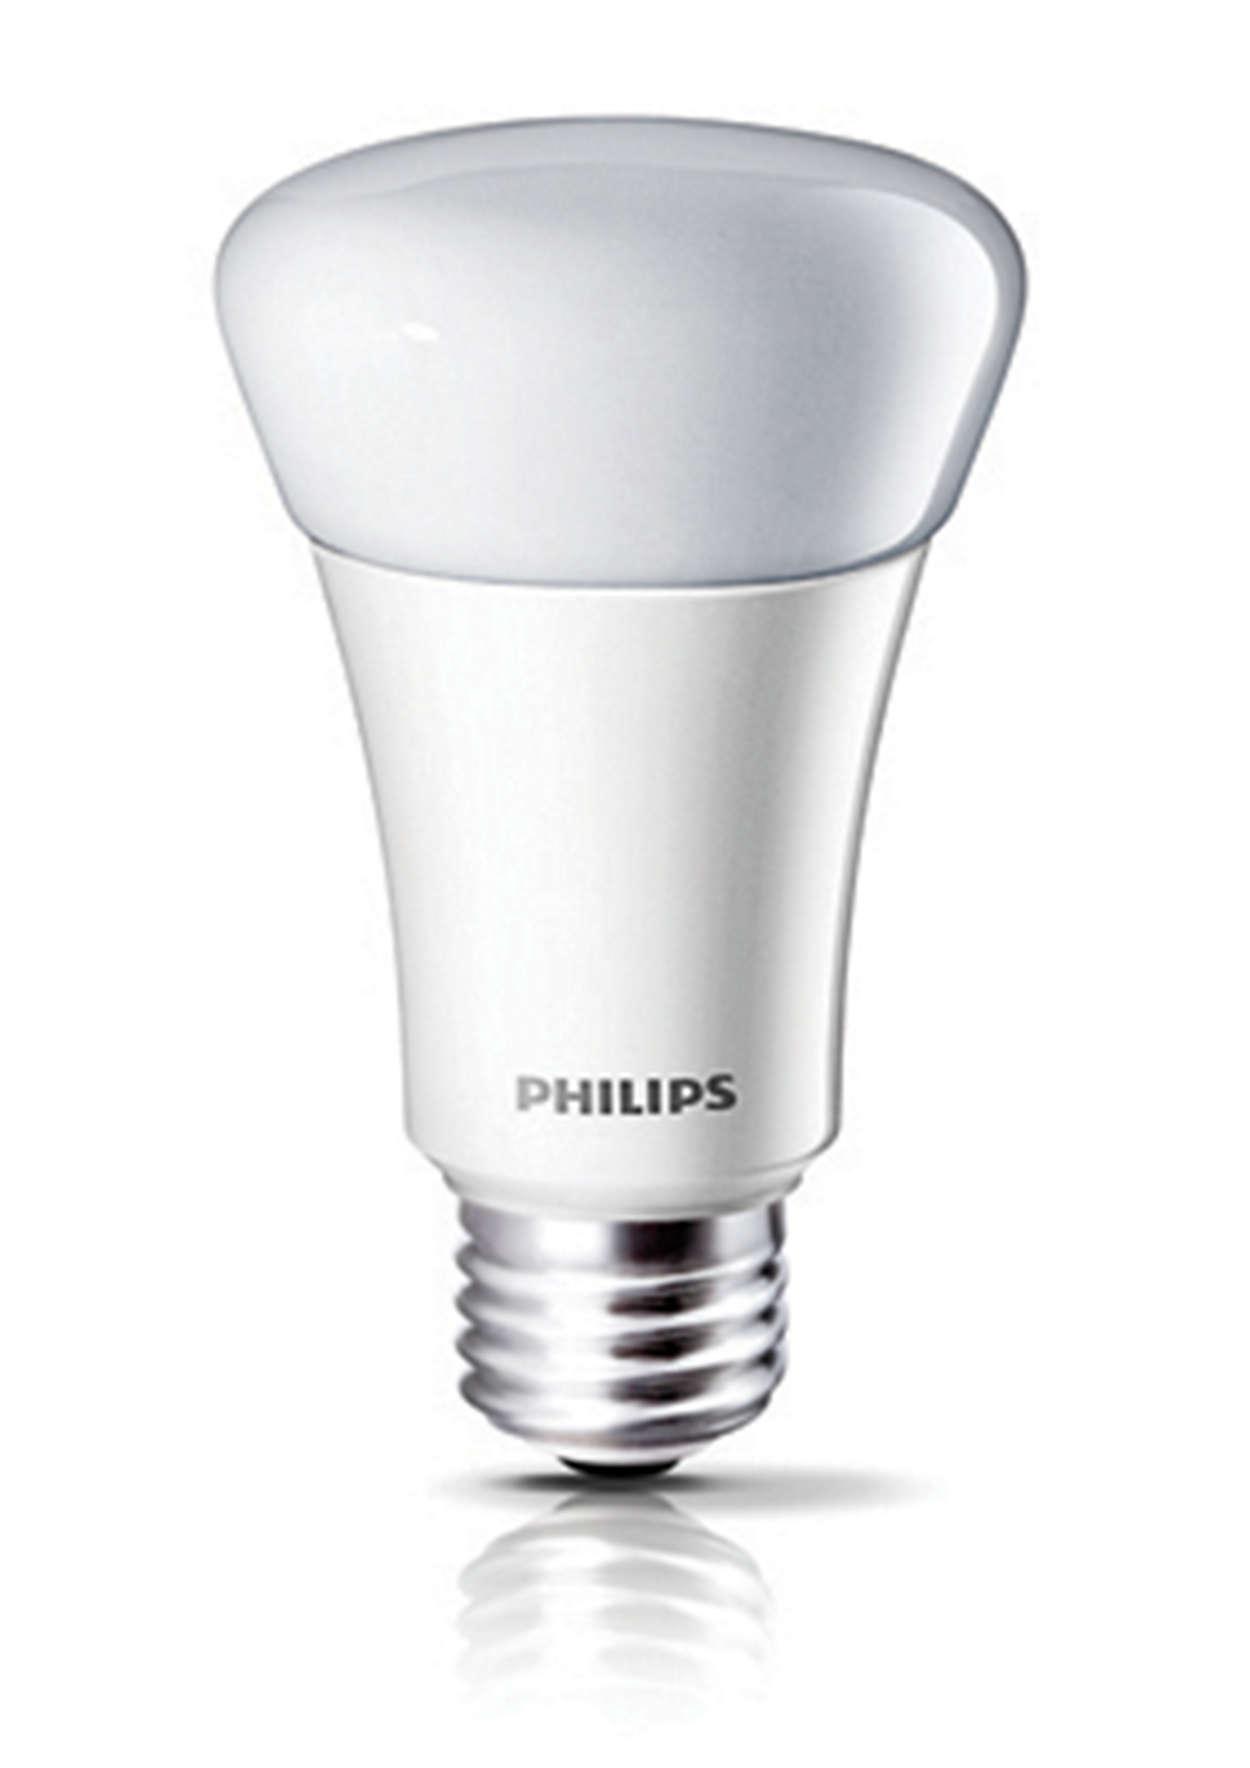 Pruebe las luces LED de blanco cálido regulables